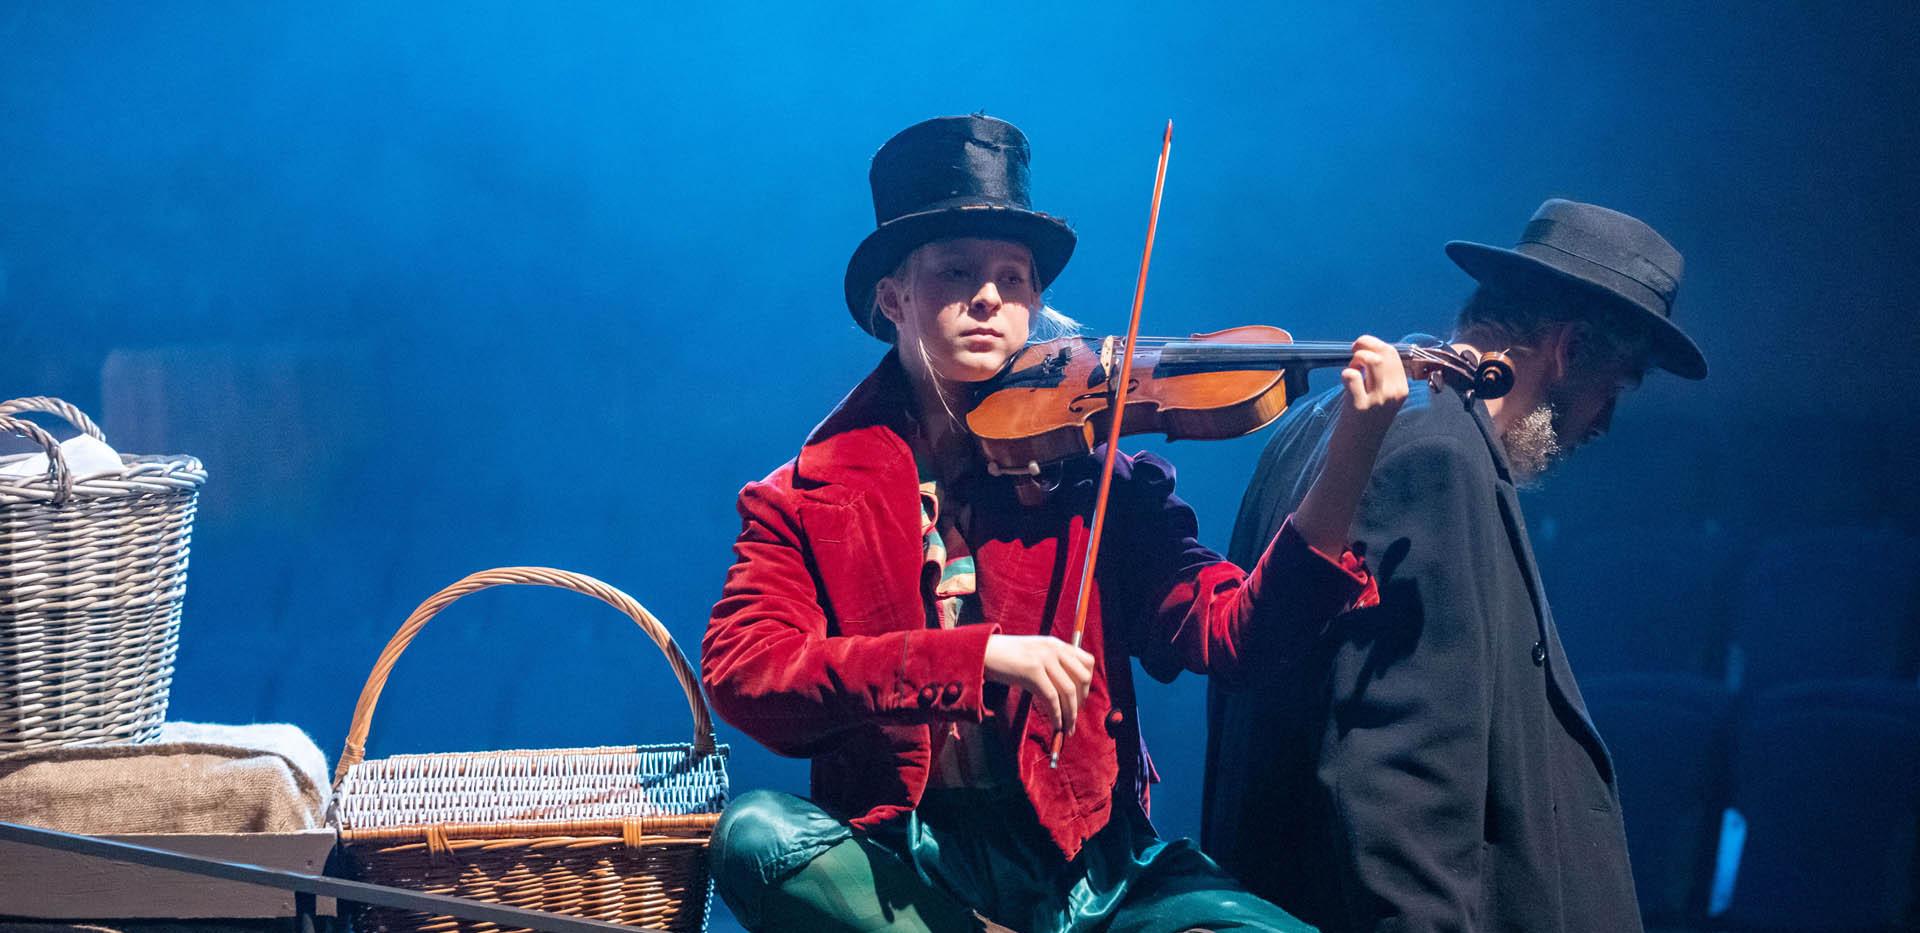 Eltham College: Fiddler on the Roof